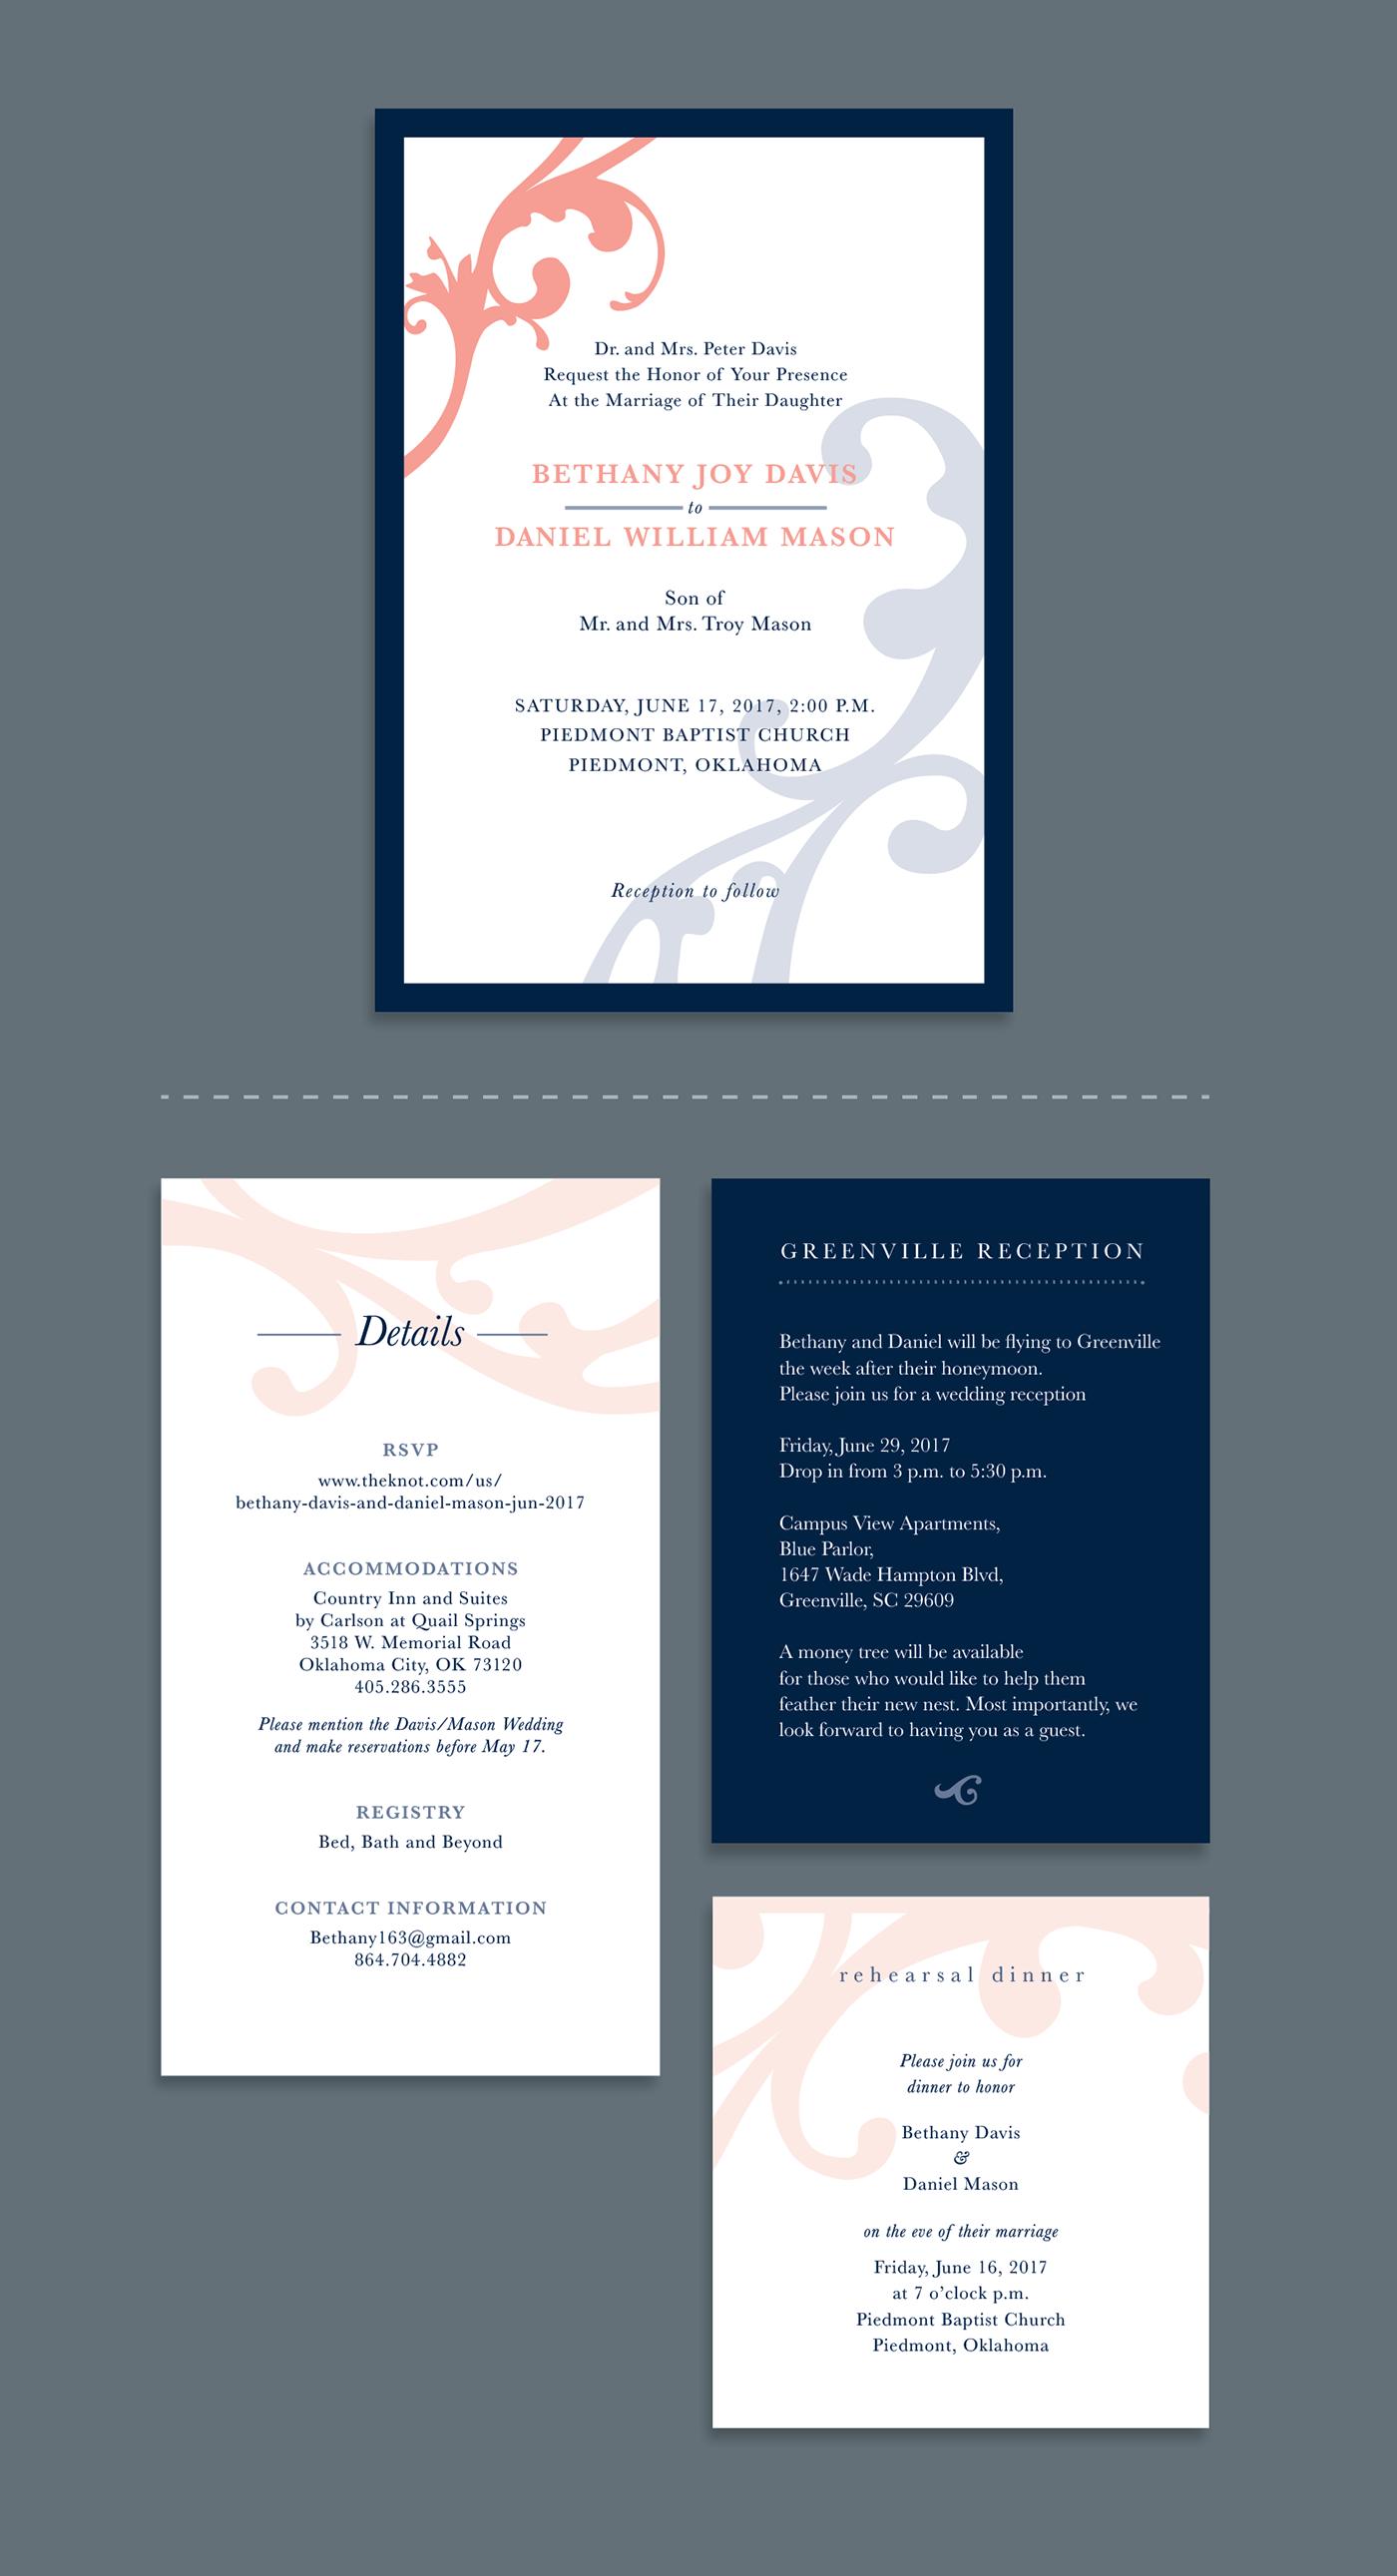 Davis/Mason Wedding Invites on Behance